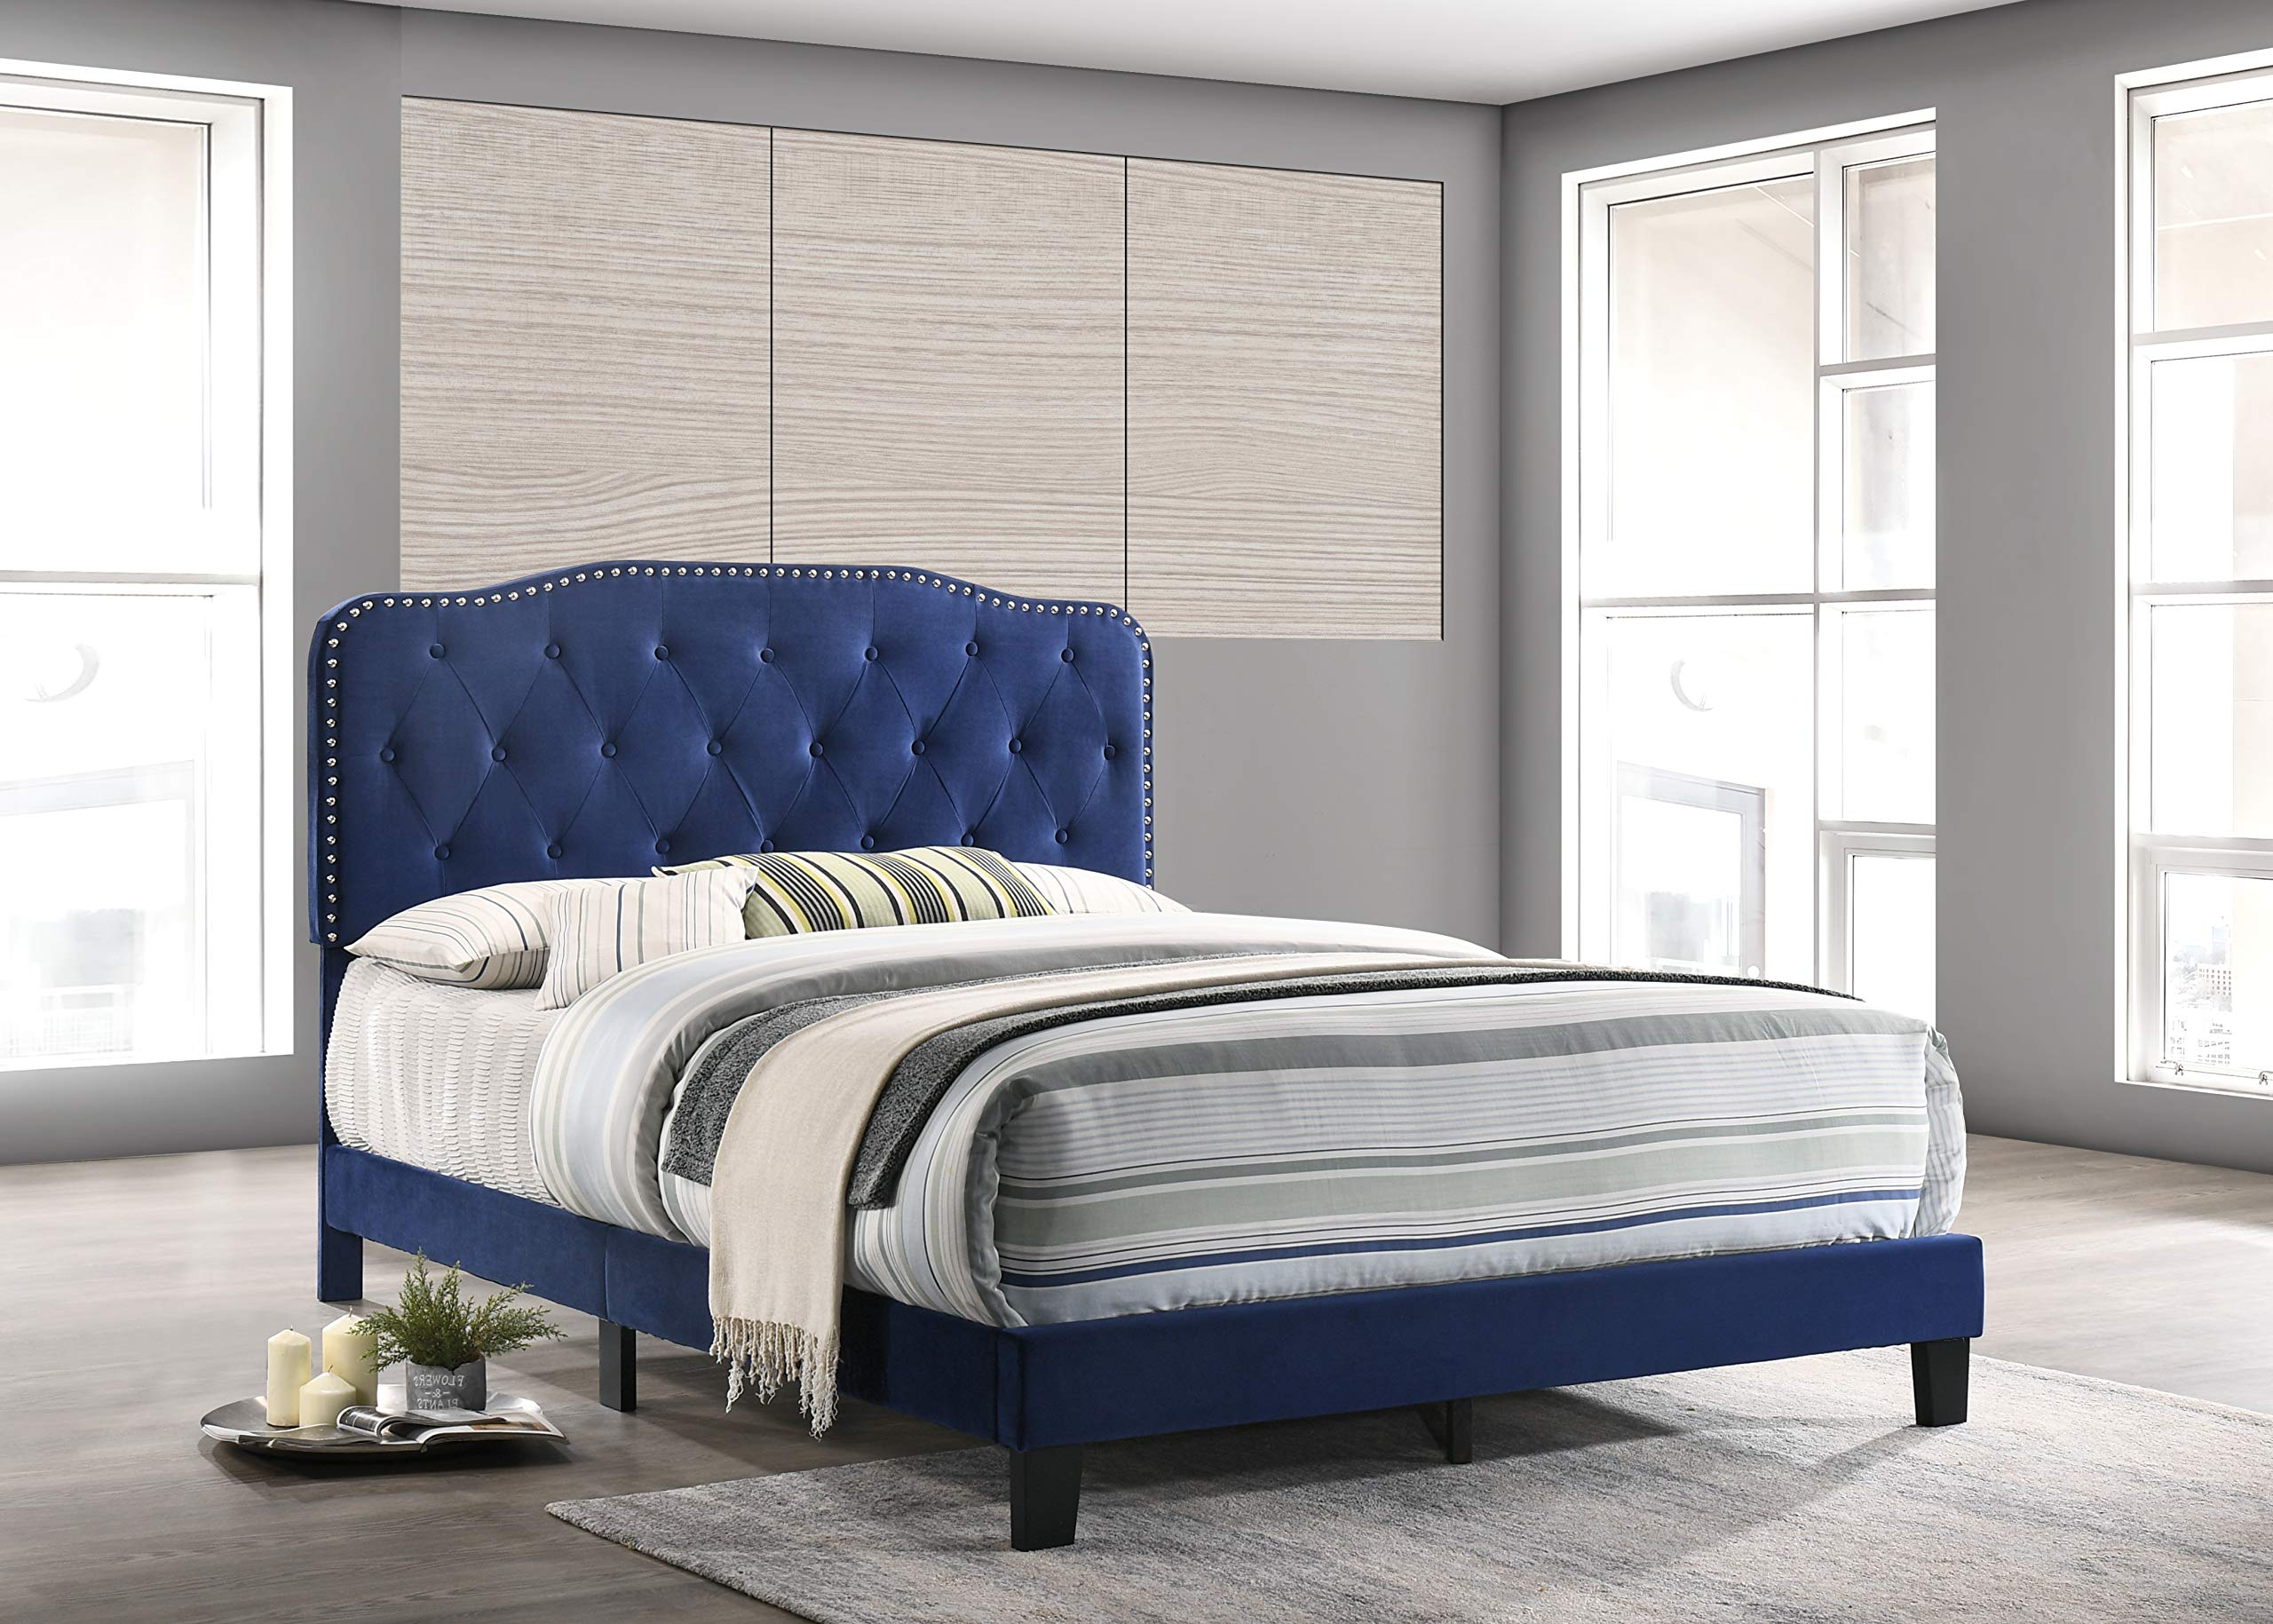 Furniture B103-FB Platform, Full, Navy Blue by Best Quality